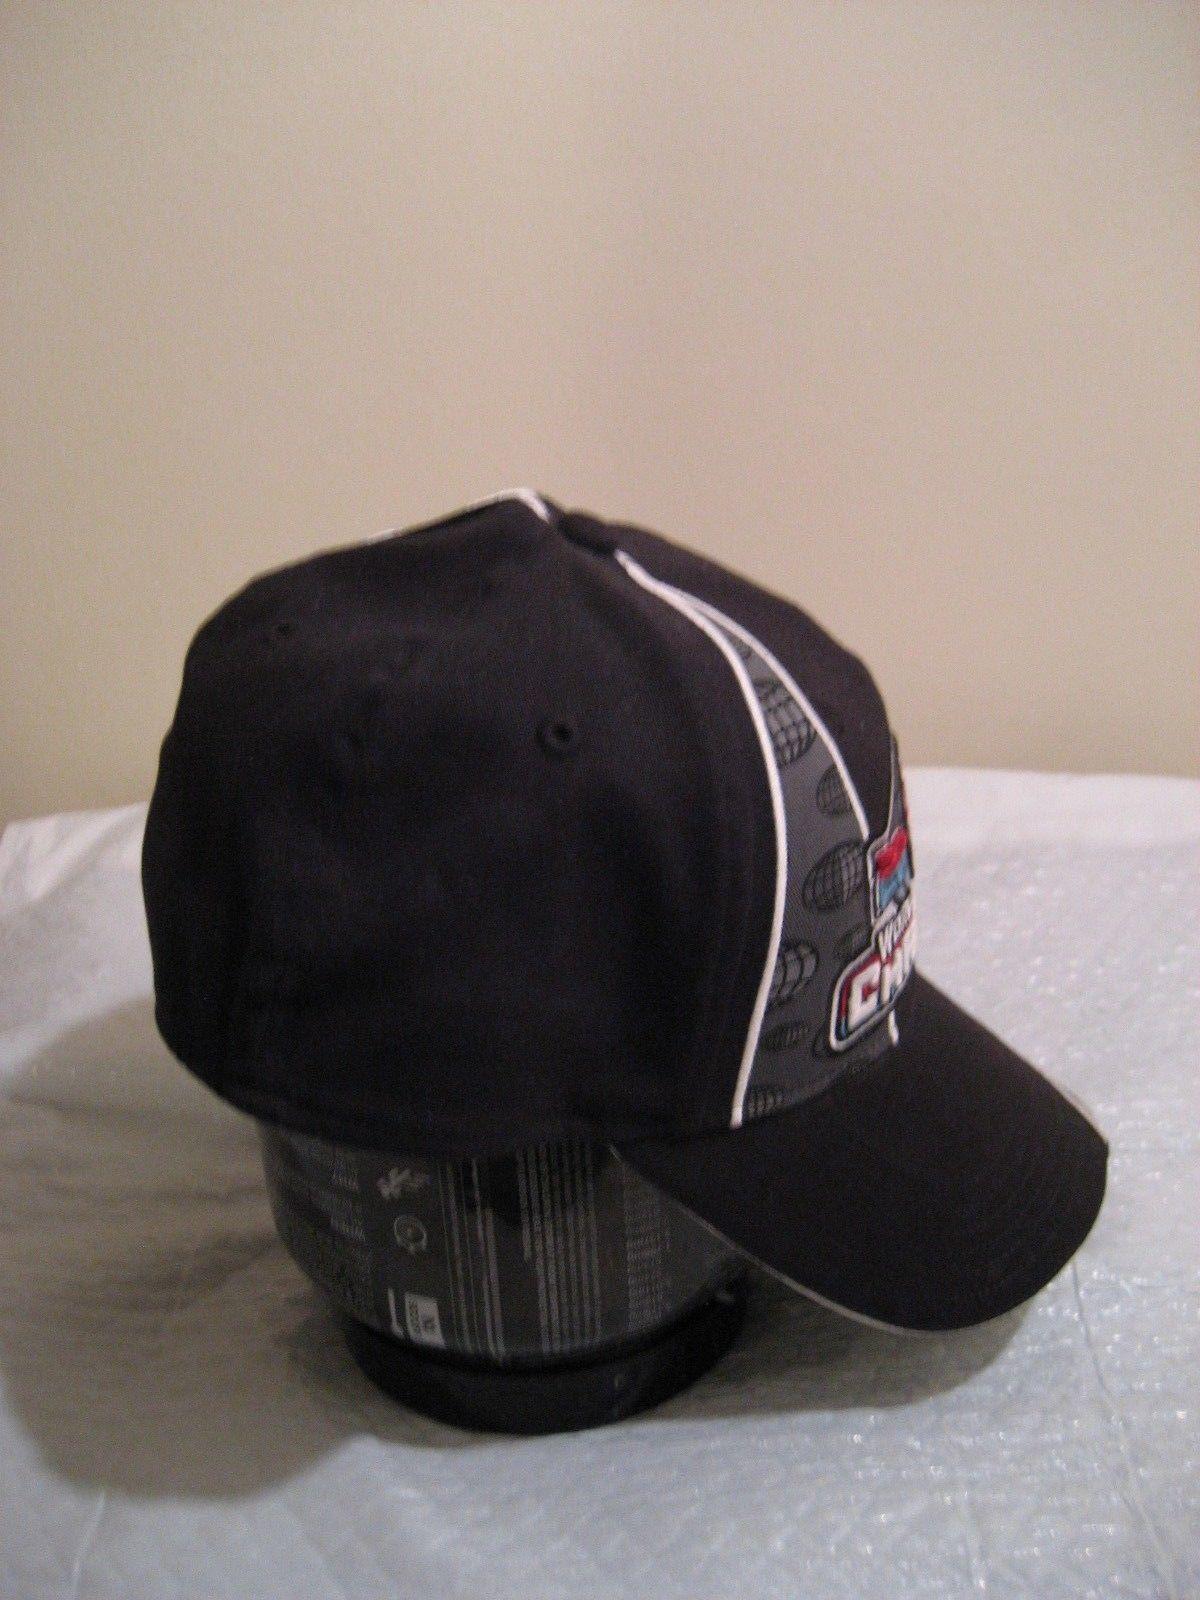 SAINT LOUIS 2006 WORLD SERIES CHAMPIONS CAP/HAT BY NEW ERA, size large